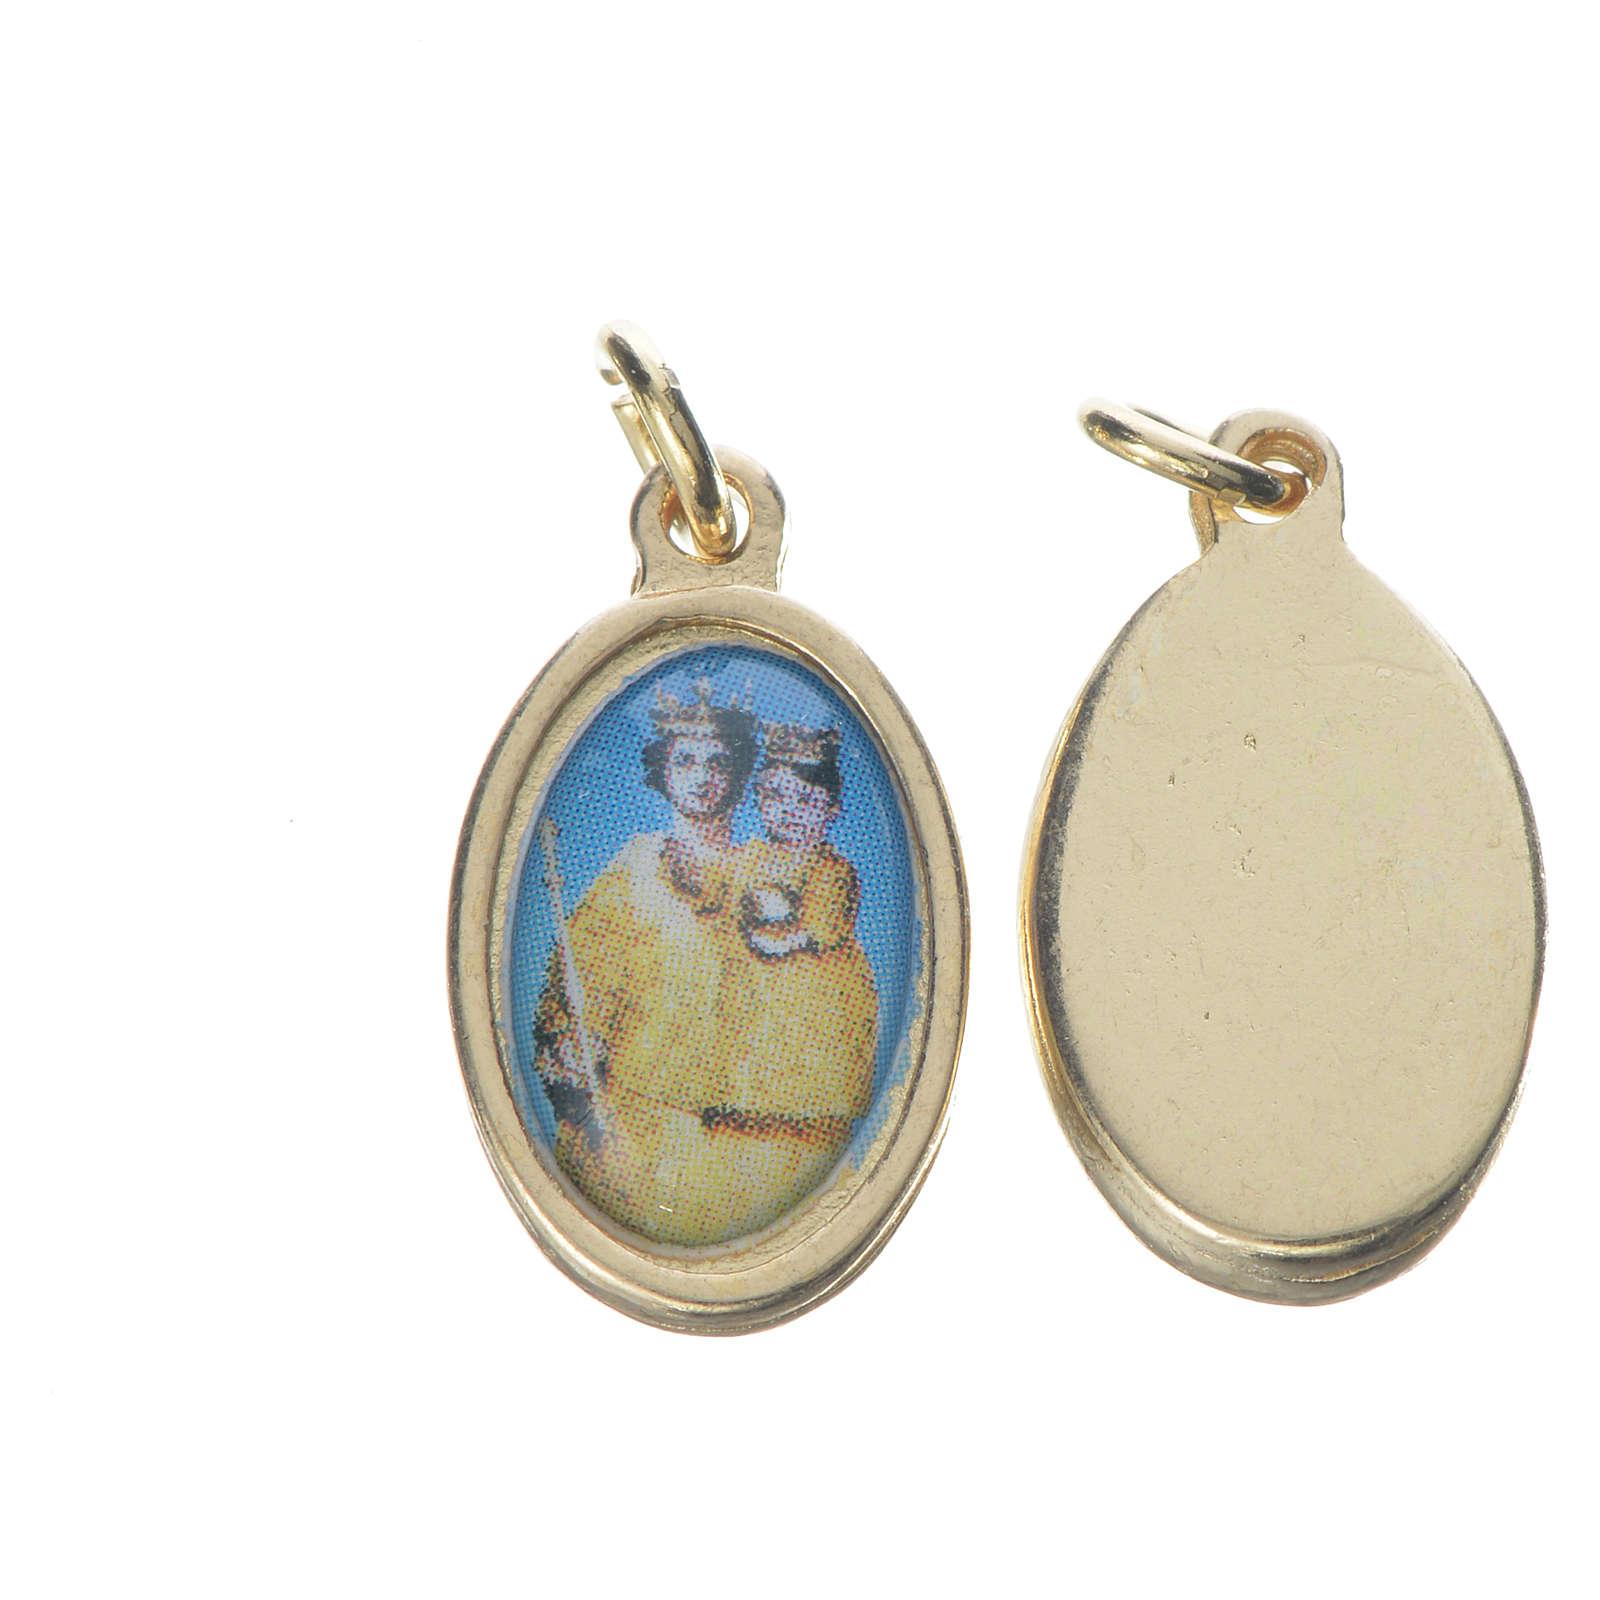 Notre Dame de Grâce medal in golden metal, 1.5cm 4